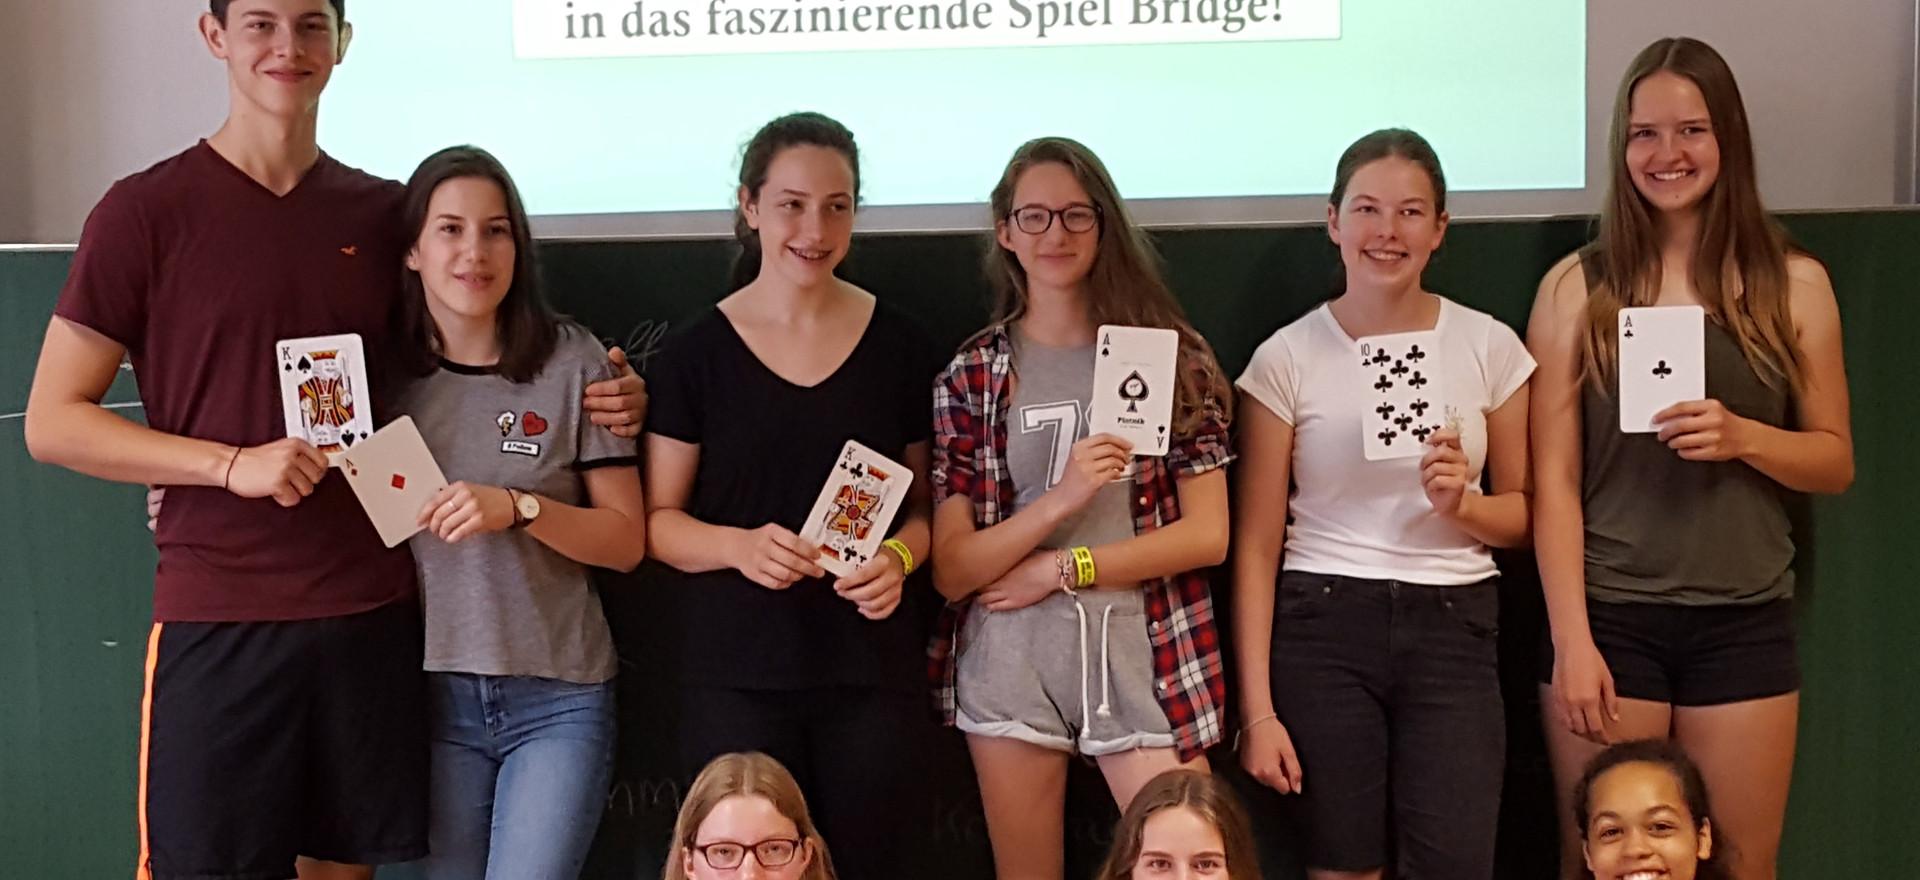 Bridgeprojekt am Kant-Gymnasium 2018